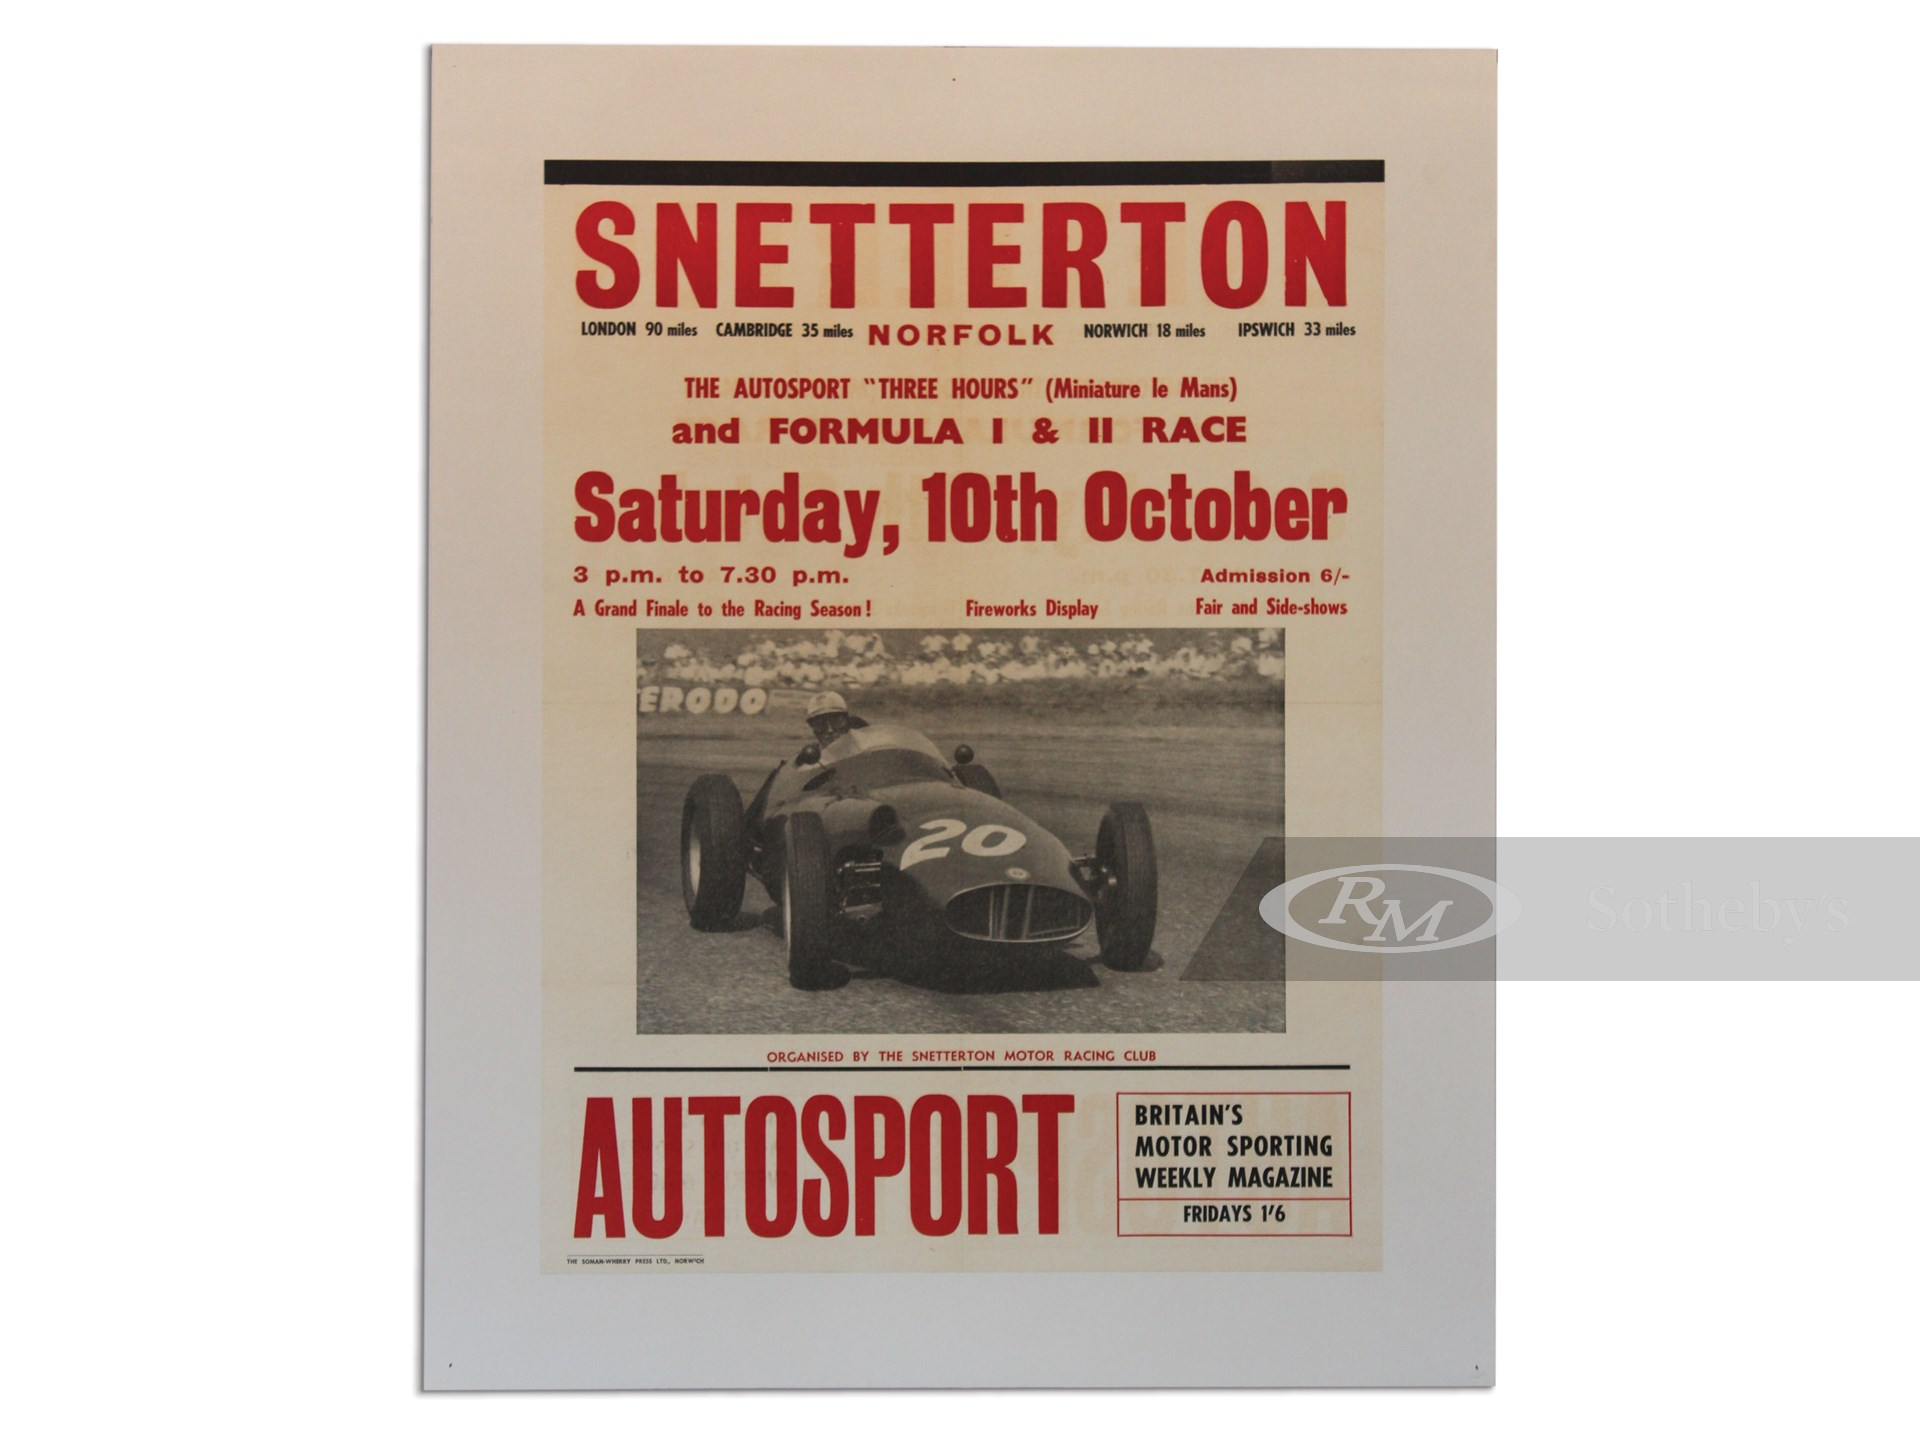 """Snetterton Norfolk The Autosport 'Three Hours' (Miniature le Mans) and Formula I & II Race"" Original Vintage Poster, ca. 1950 -"